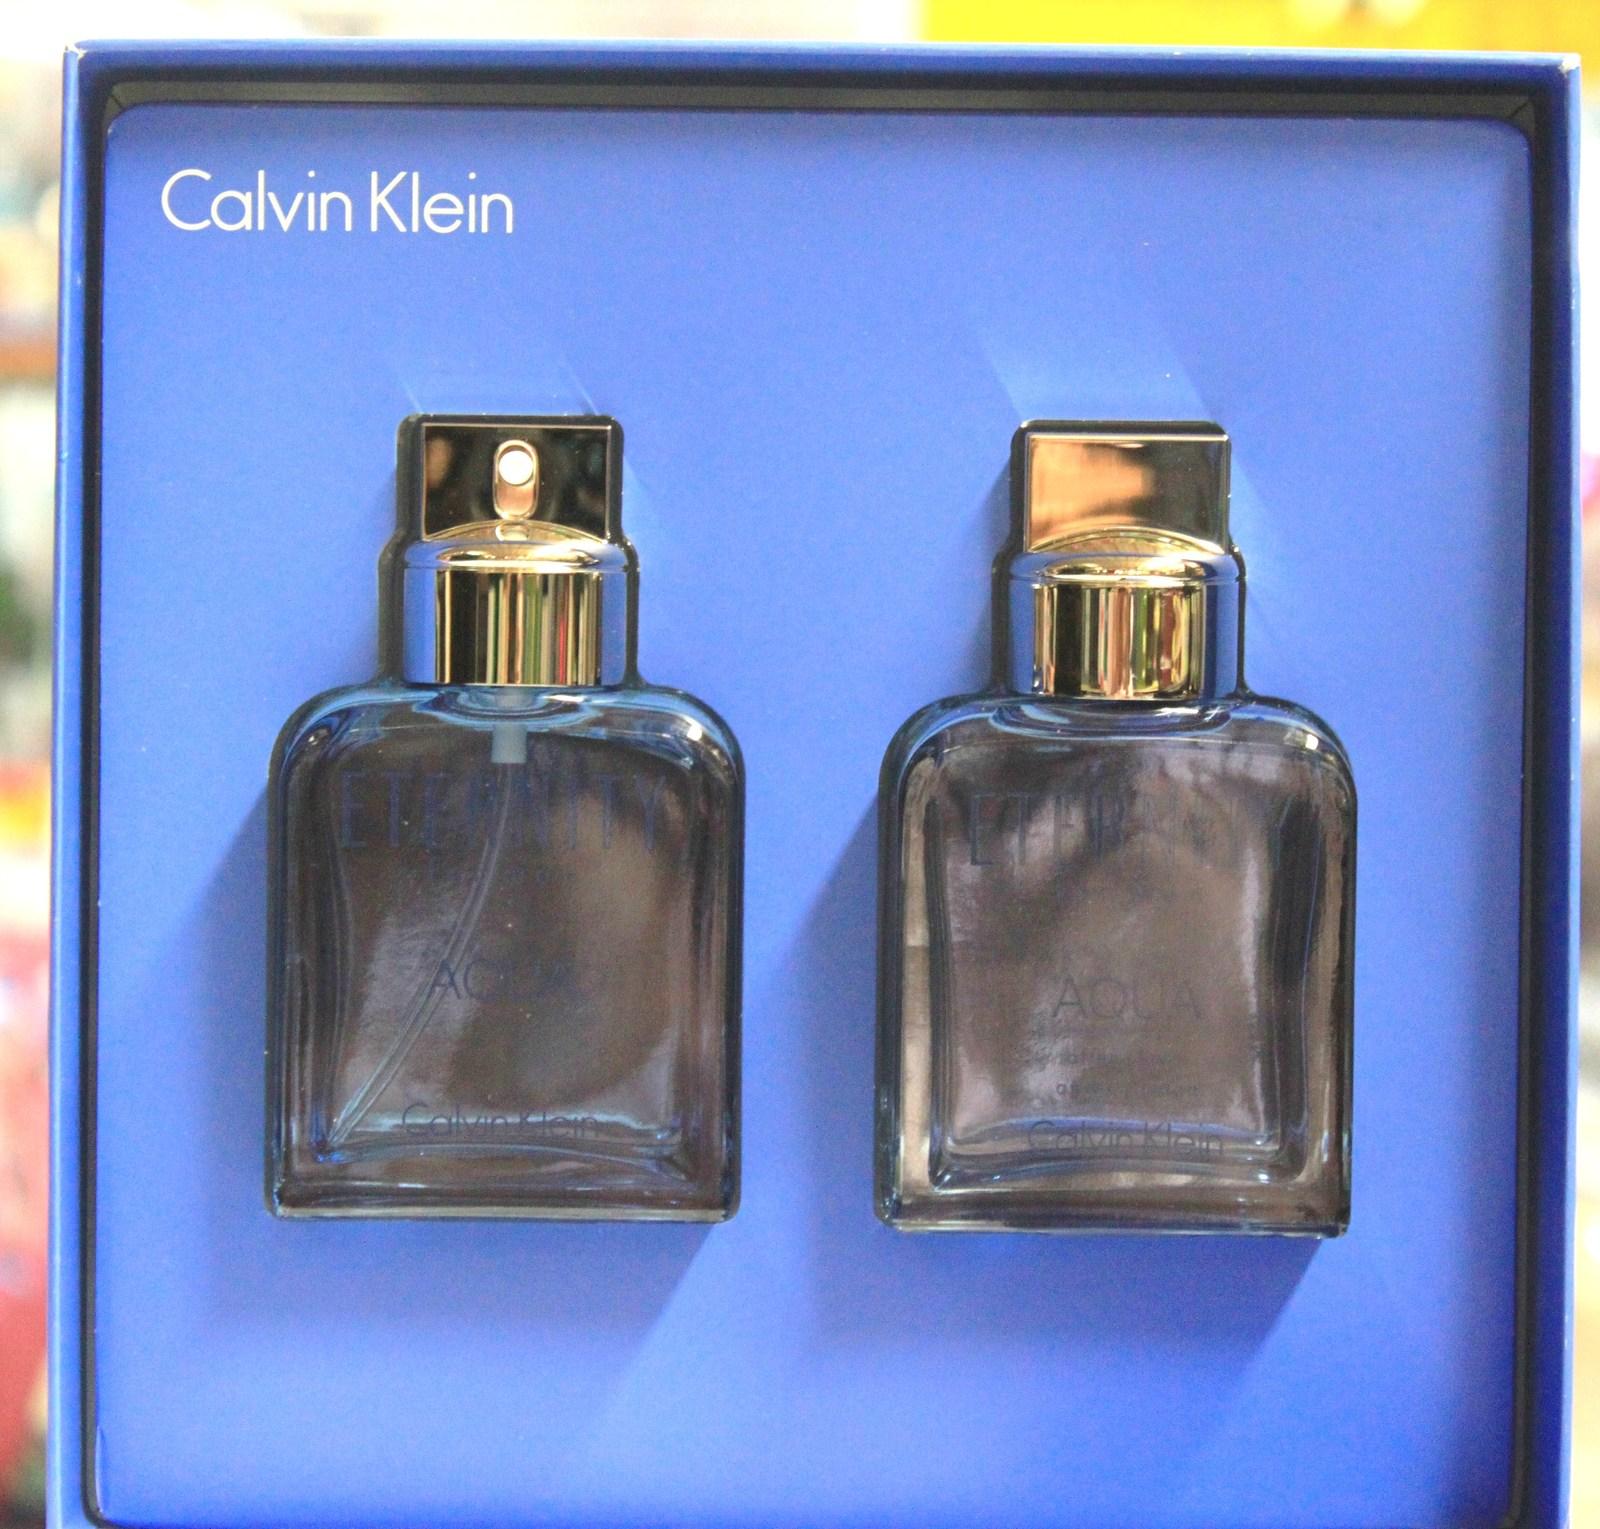 eternity aqua by calvin klein 2pcs set for men 2 glass. Black Bedroom Furniture Sets. Home Design Ideas